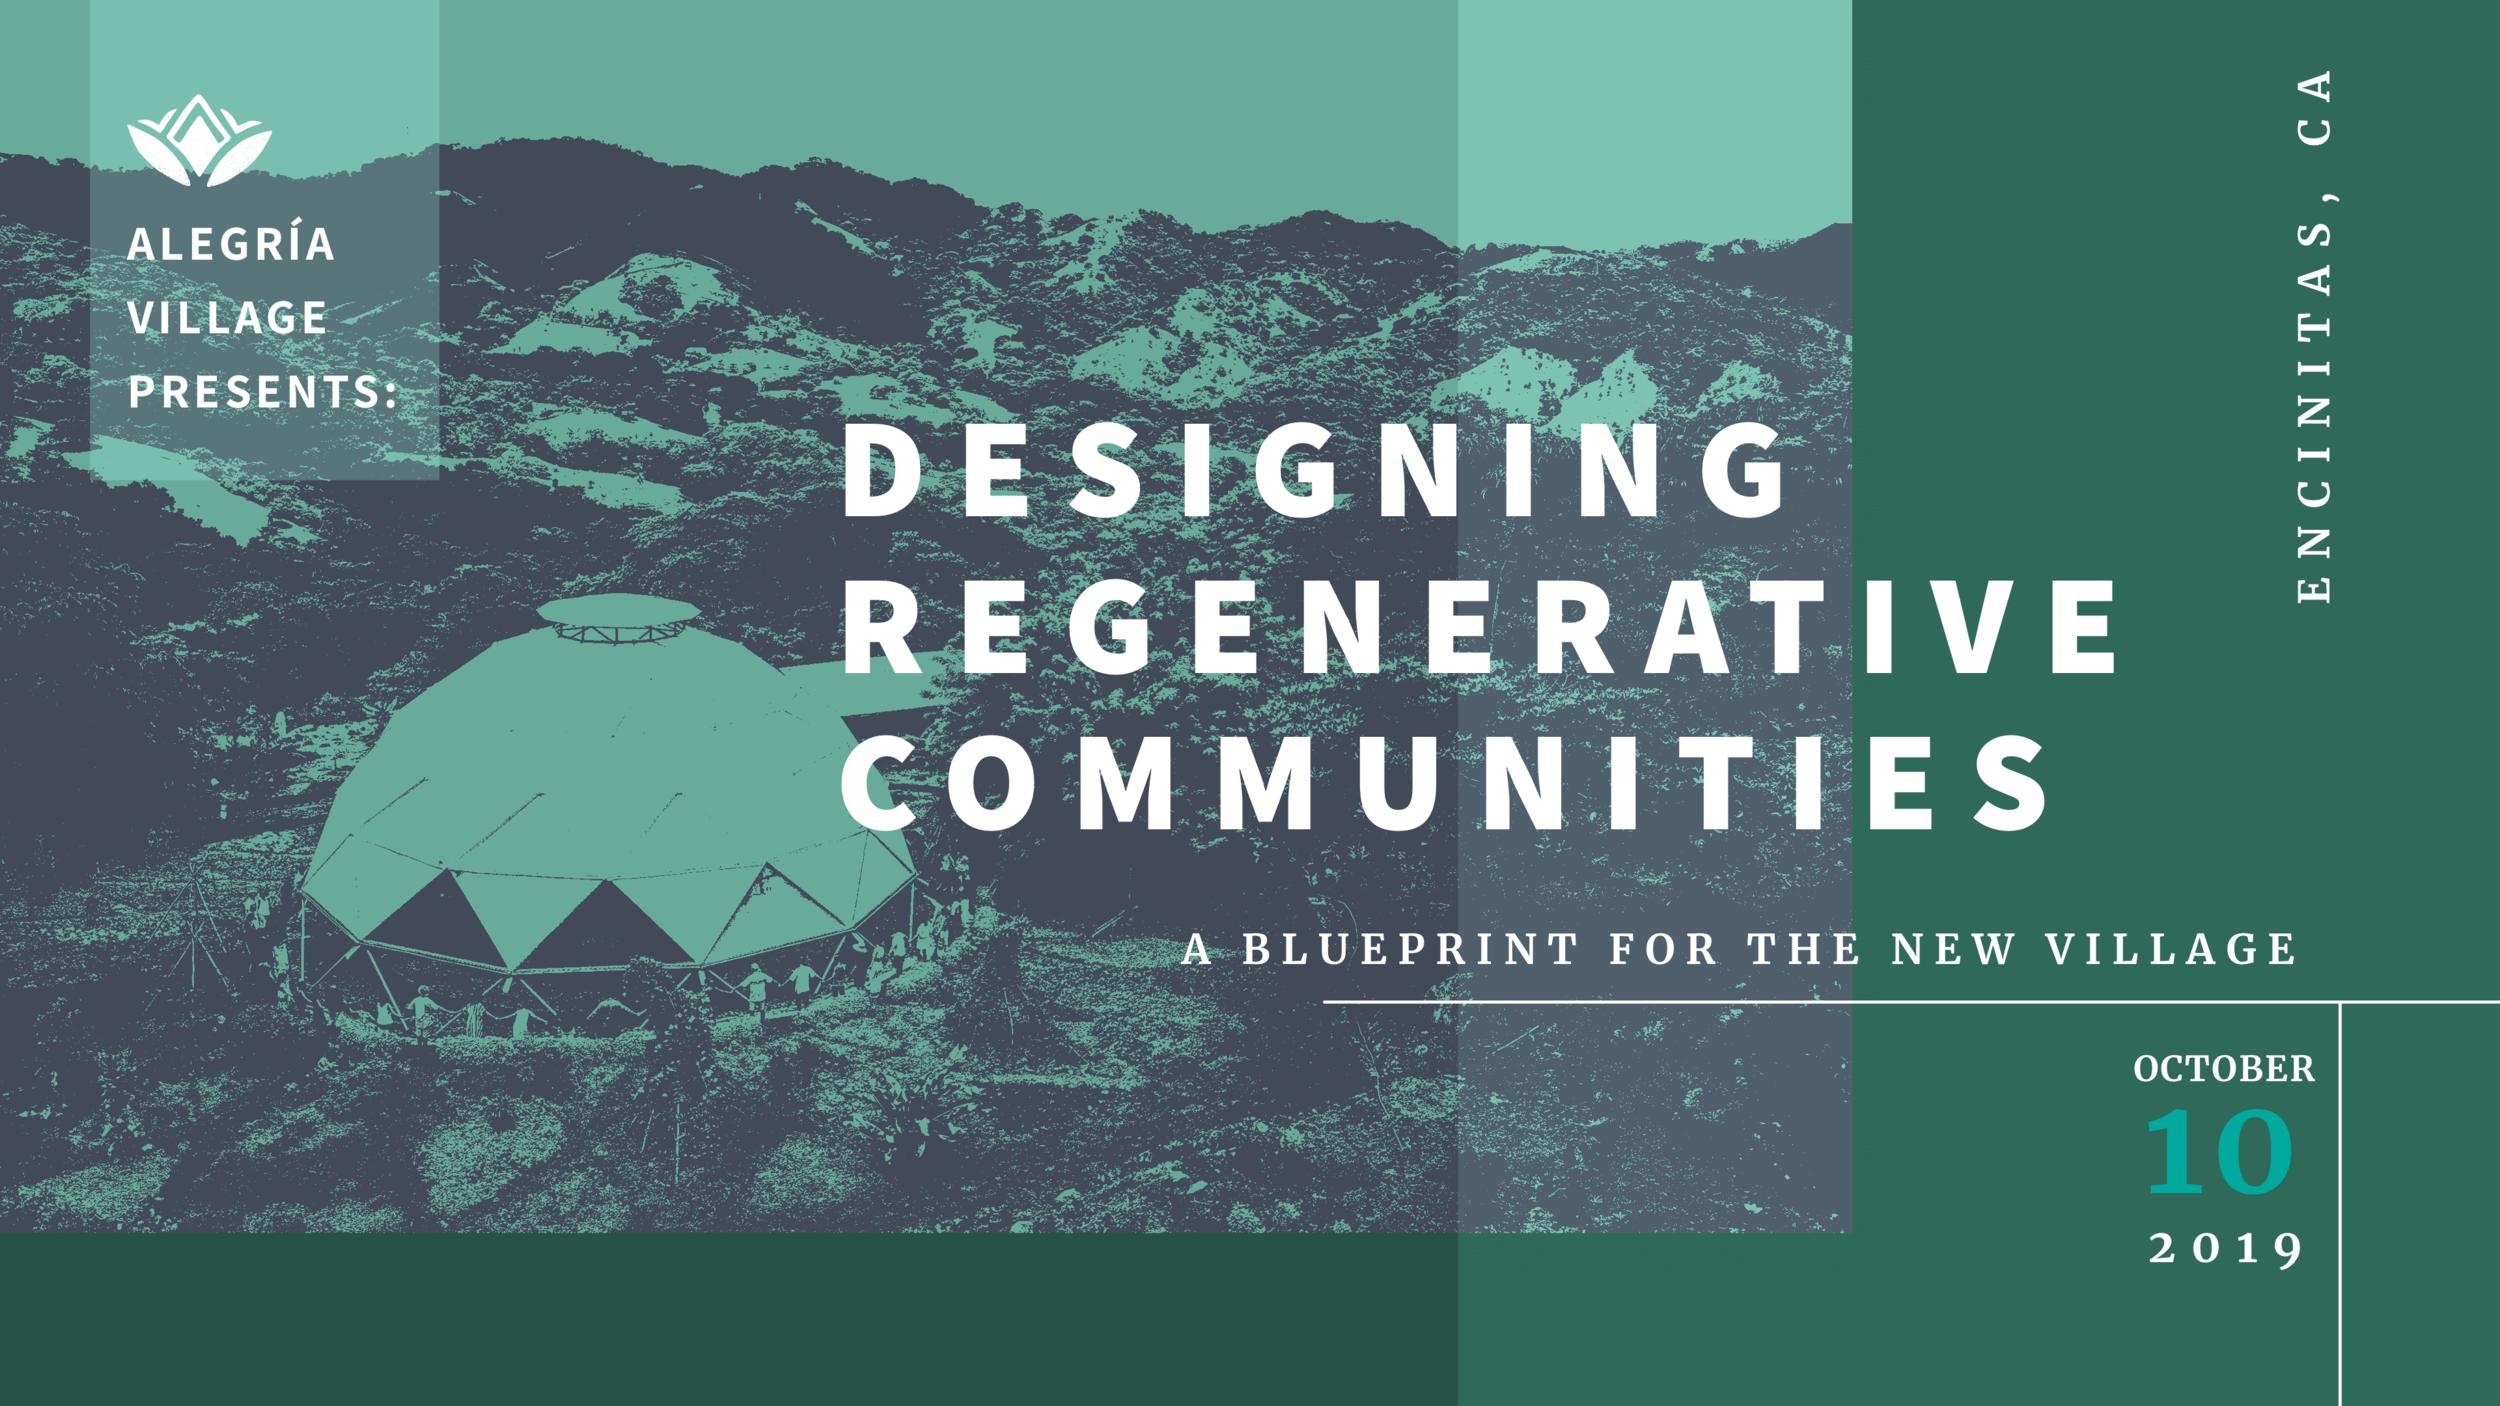 designing-regen-comm-encinitas-facebook-banner copy 2.png